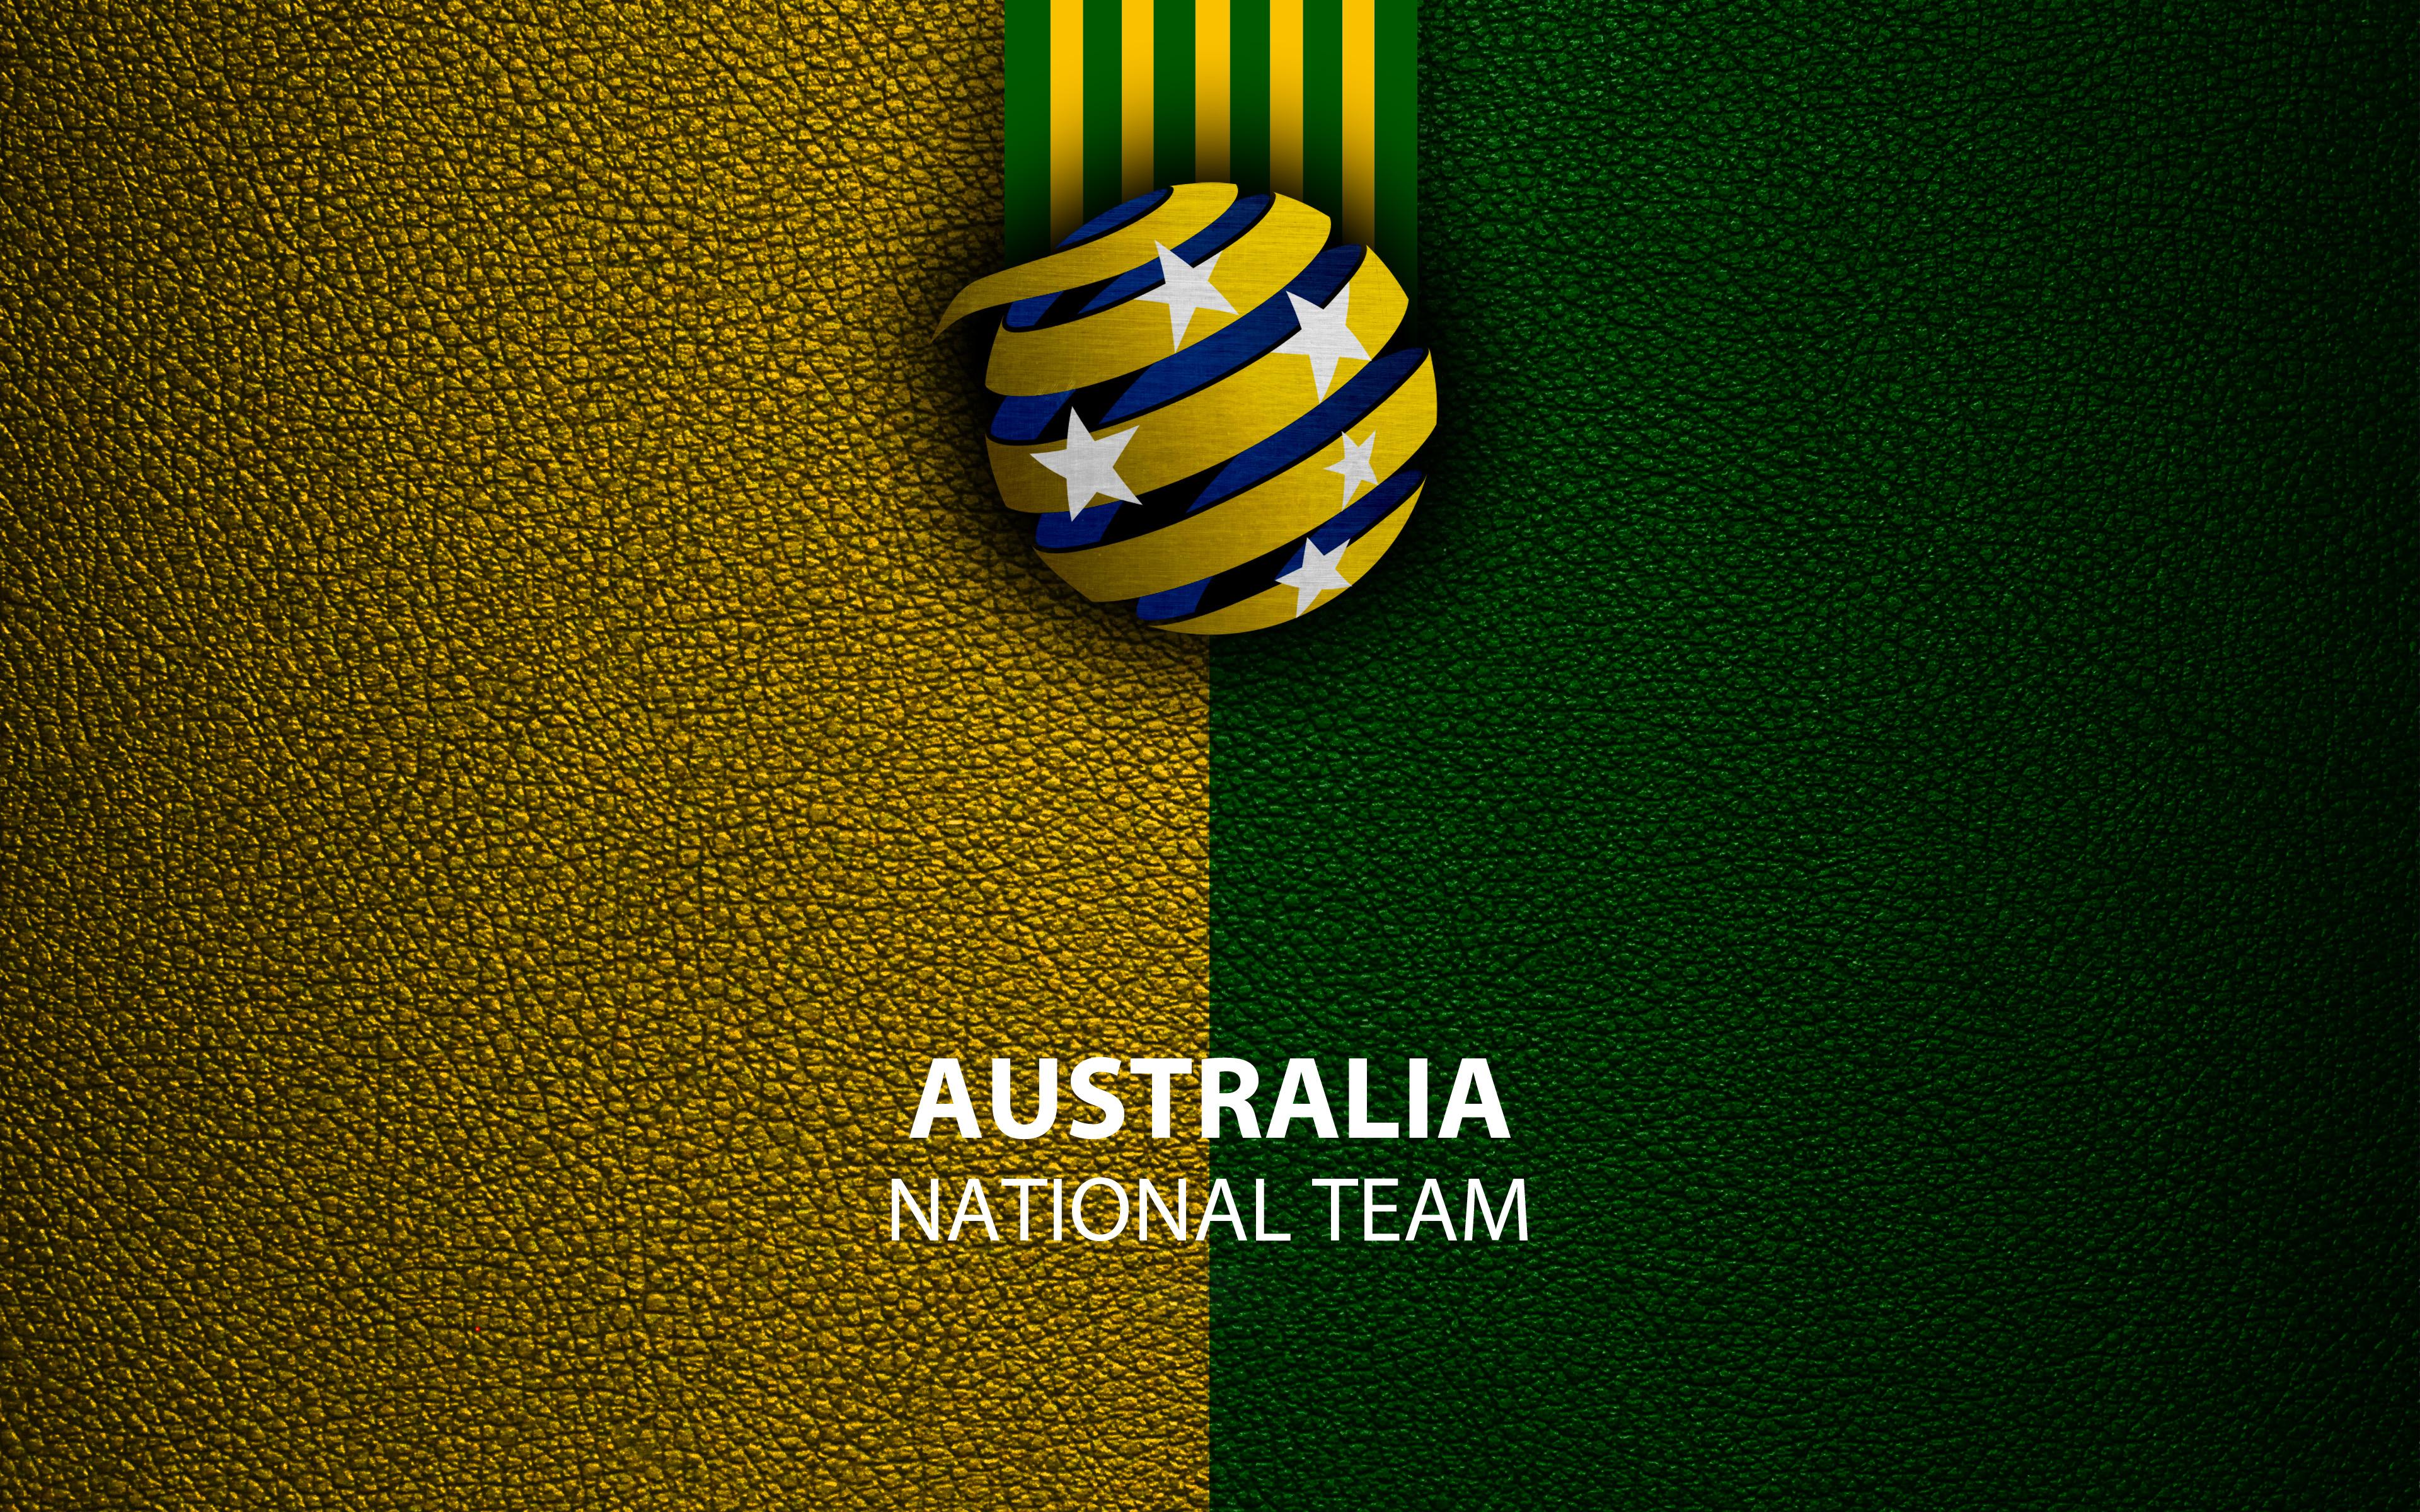 Australia National Football Background 9